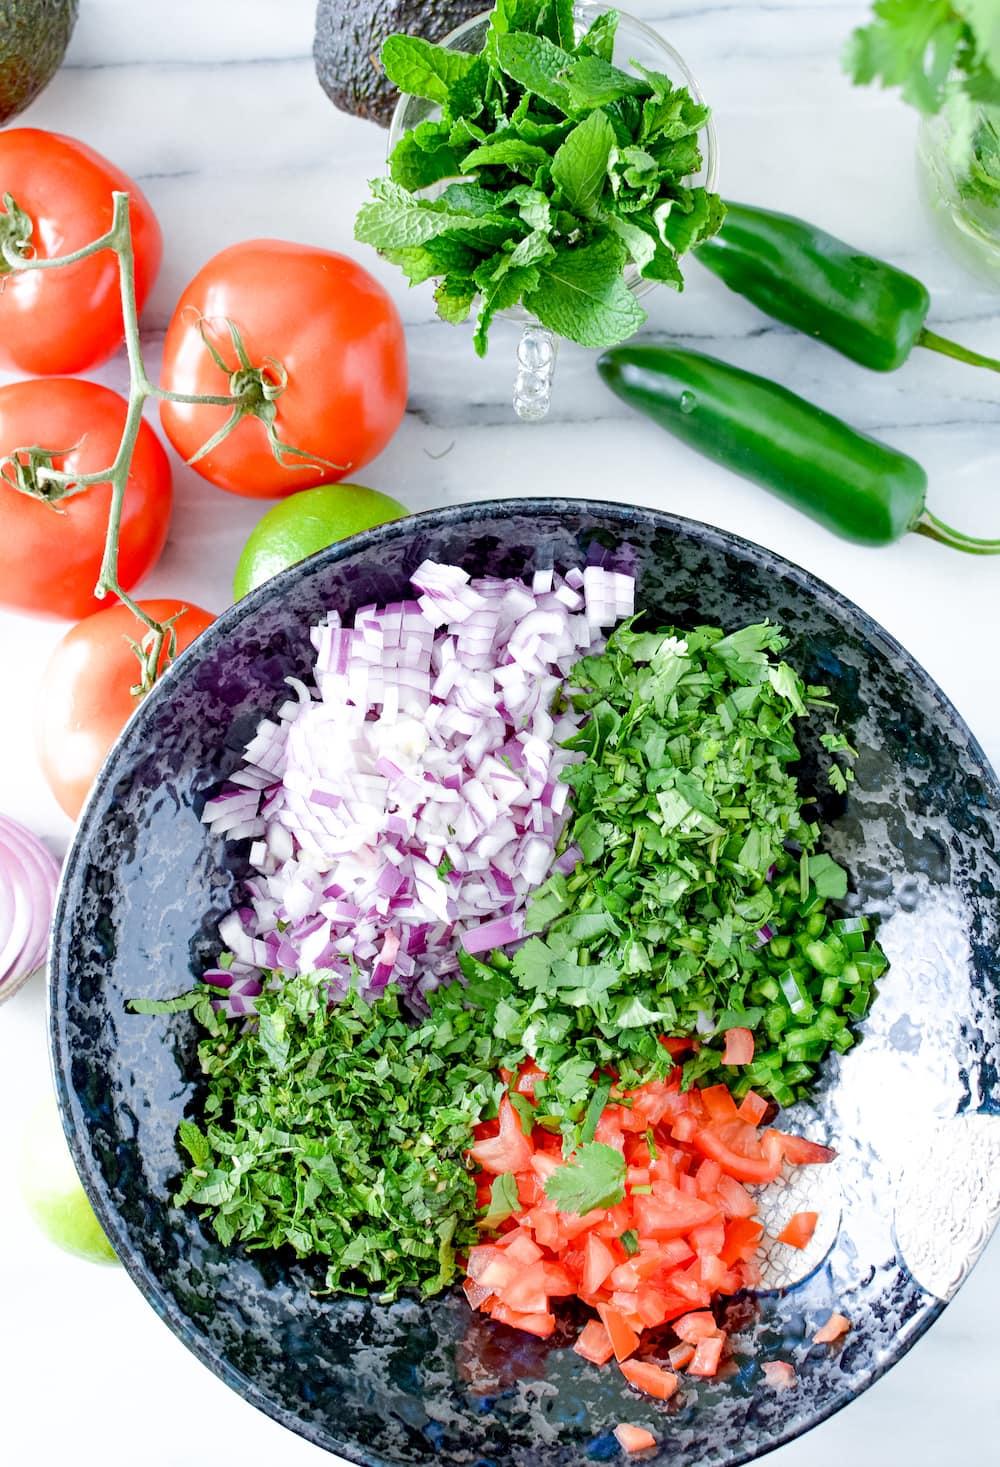 Chopped tomato, cilantro, radish, onion and mint in a bowl.